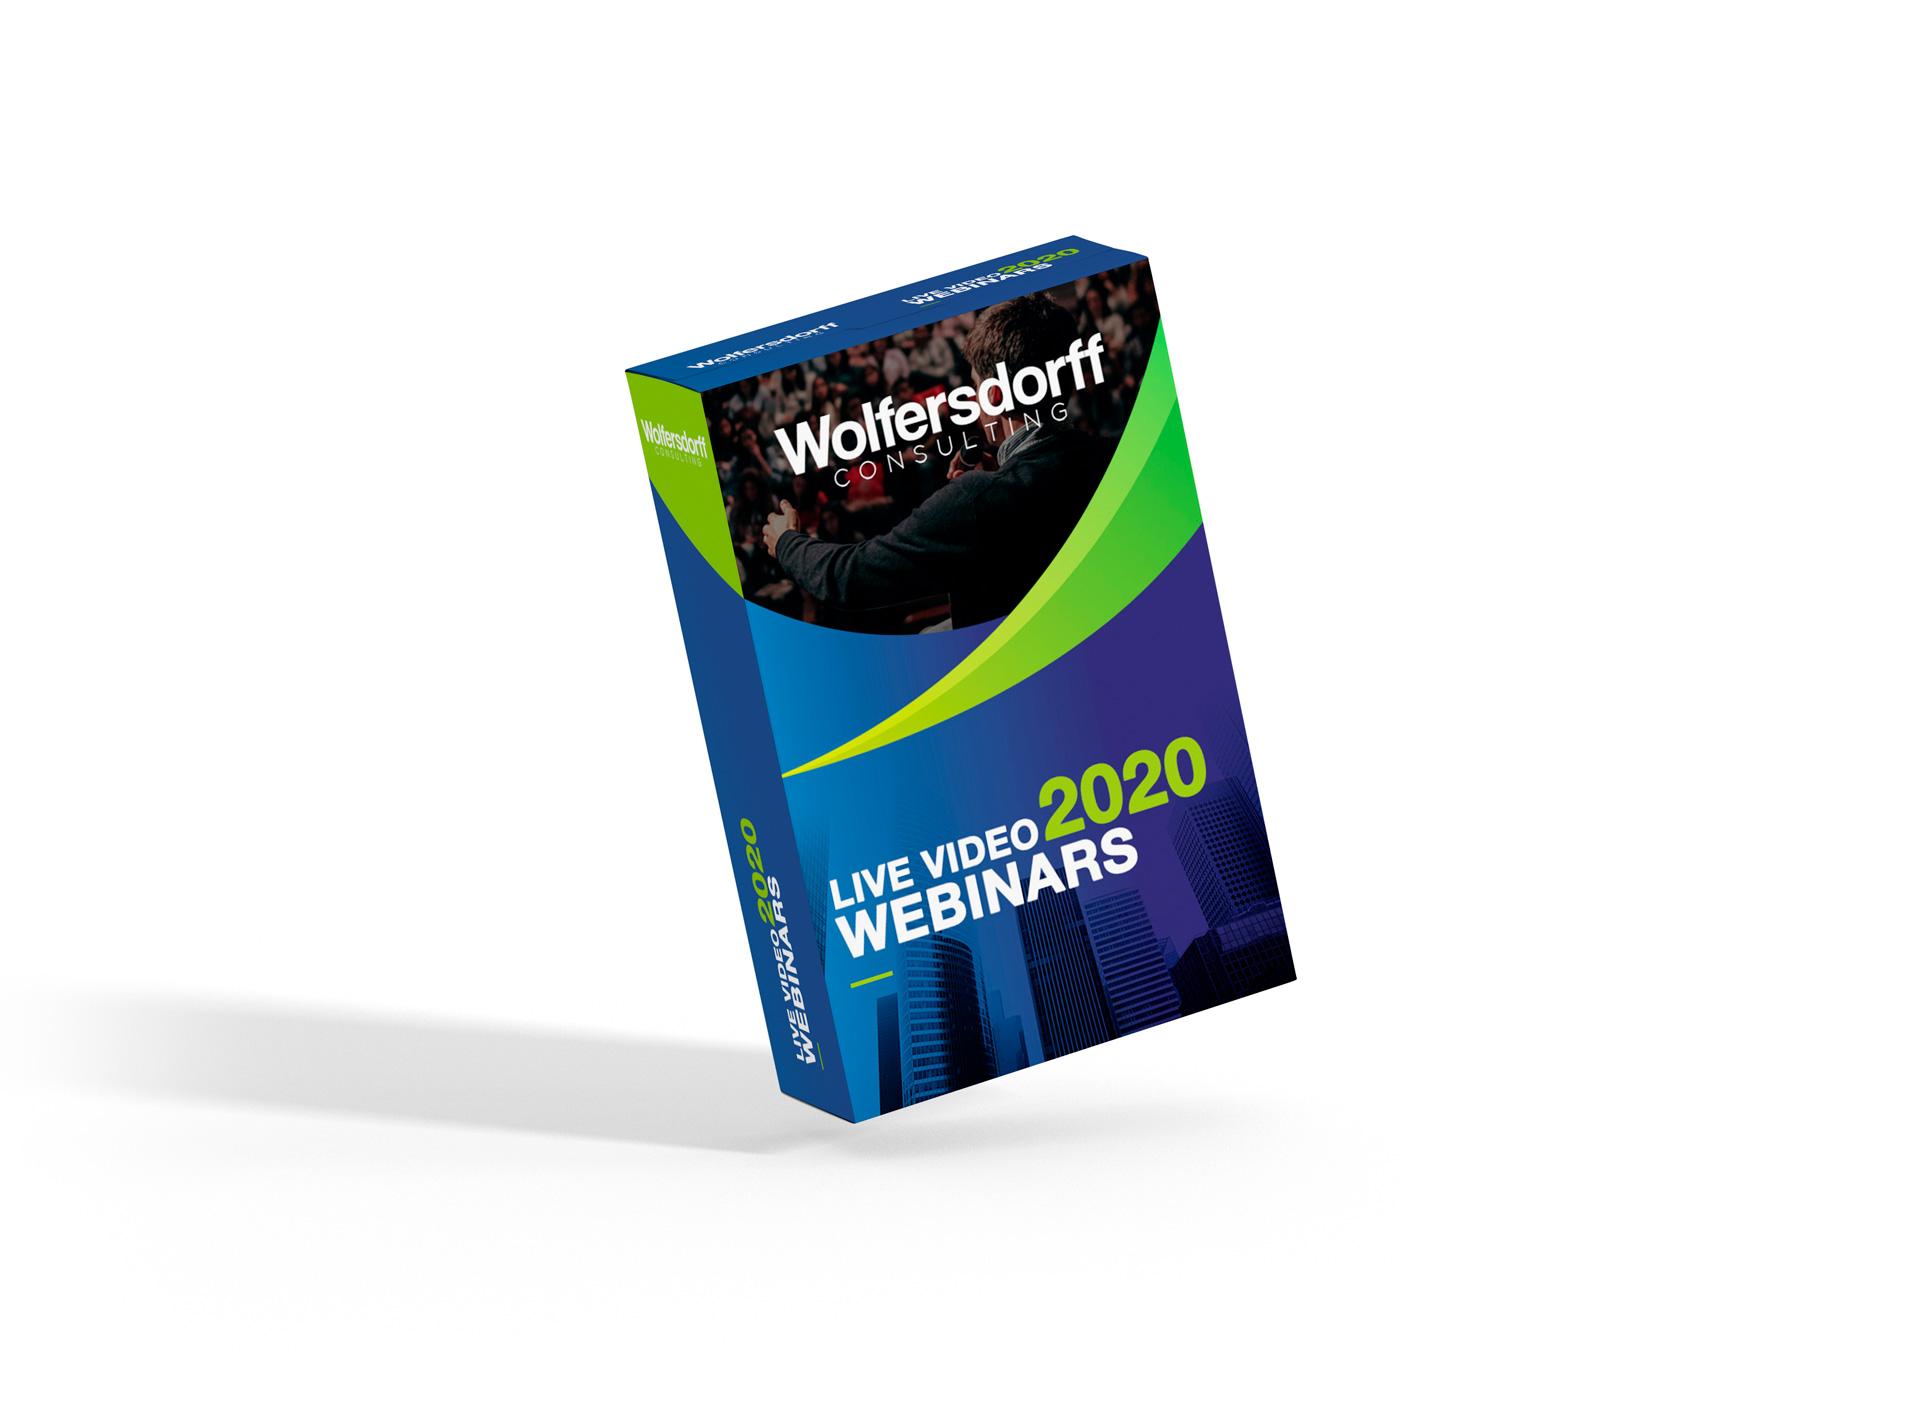 wolfersdorff-consulting-webinars